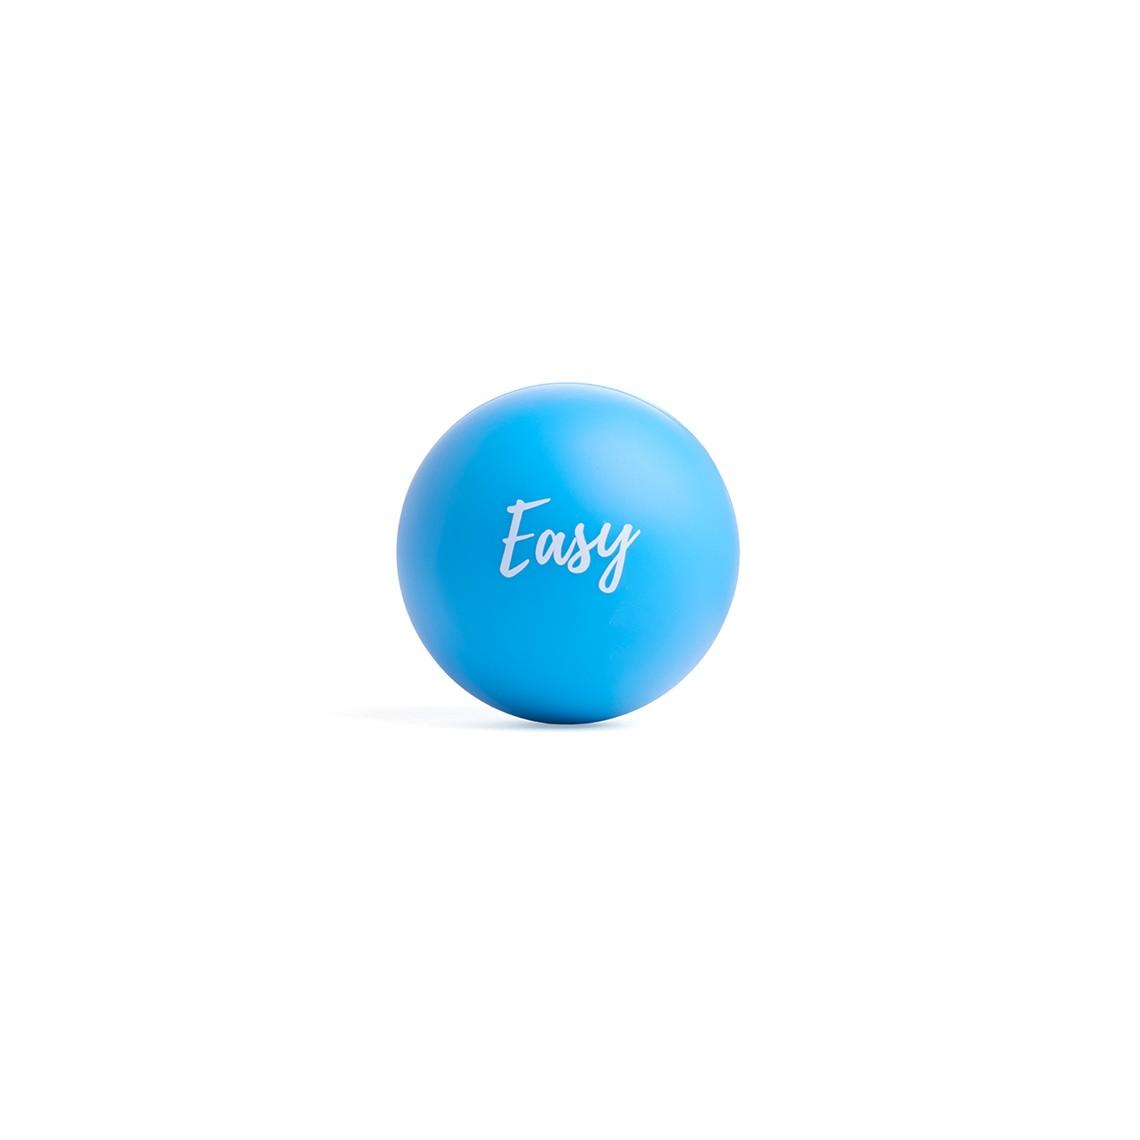 LACROSSE BALL EASY FITNESS : Kolor - Niebieski